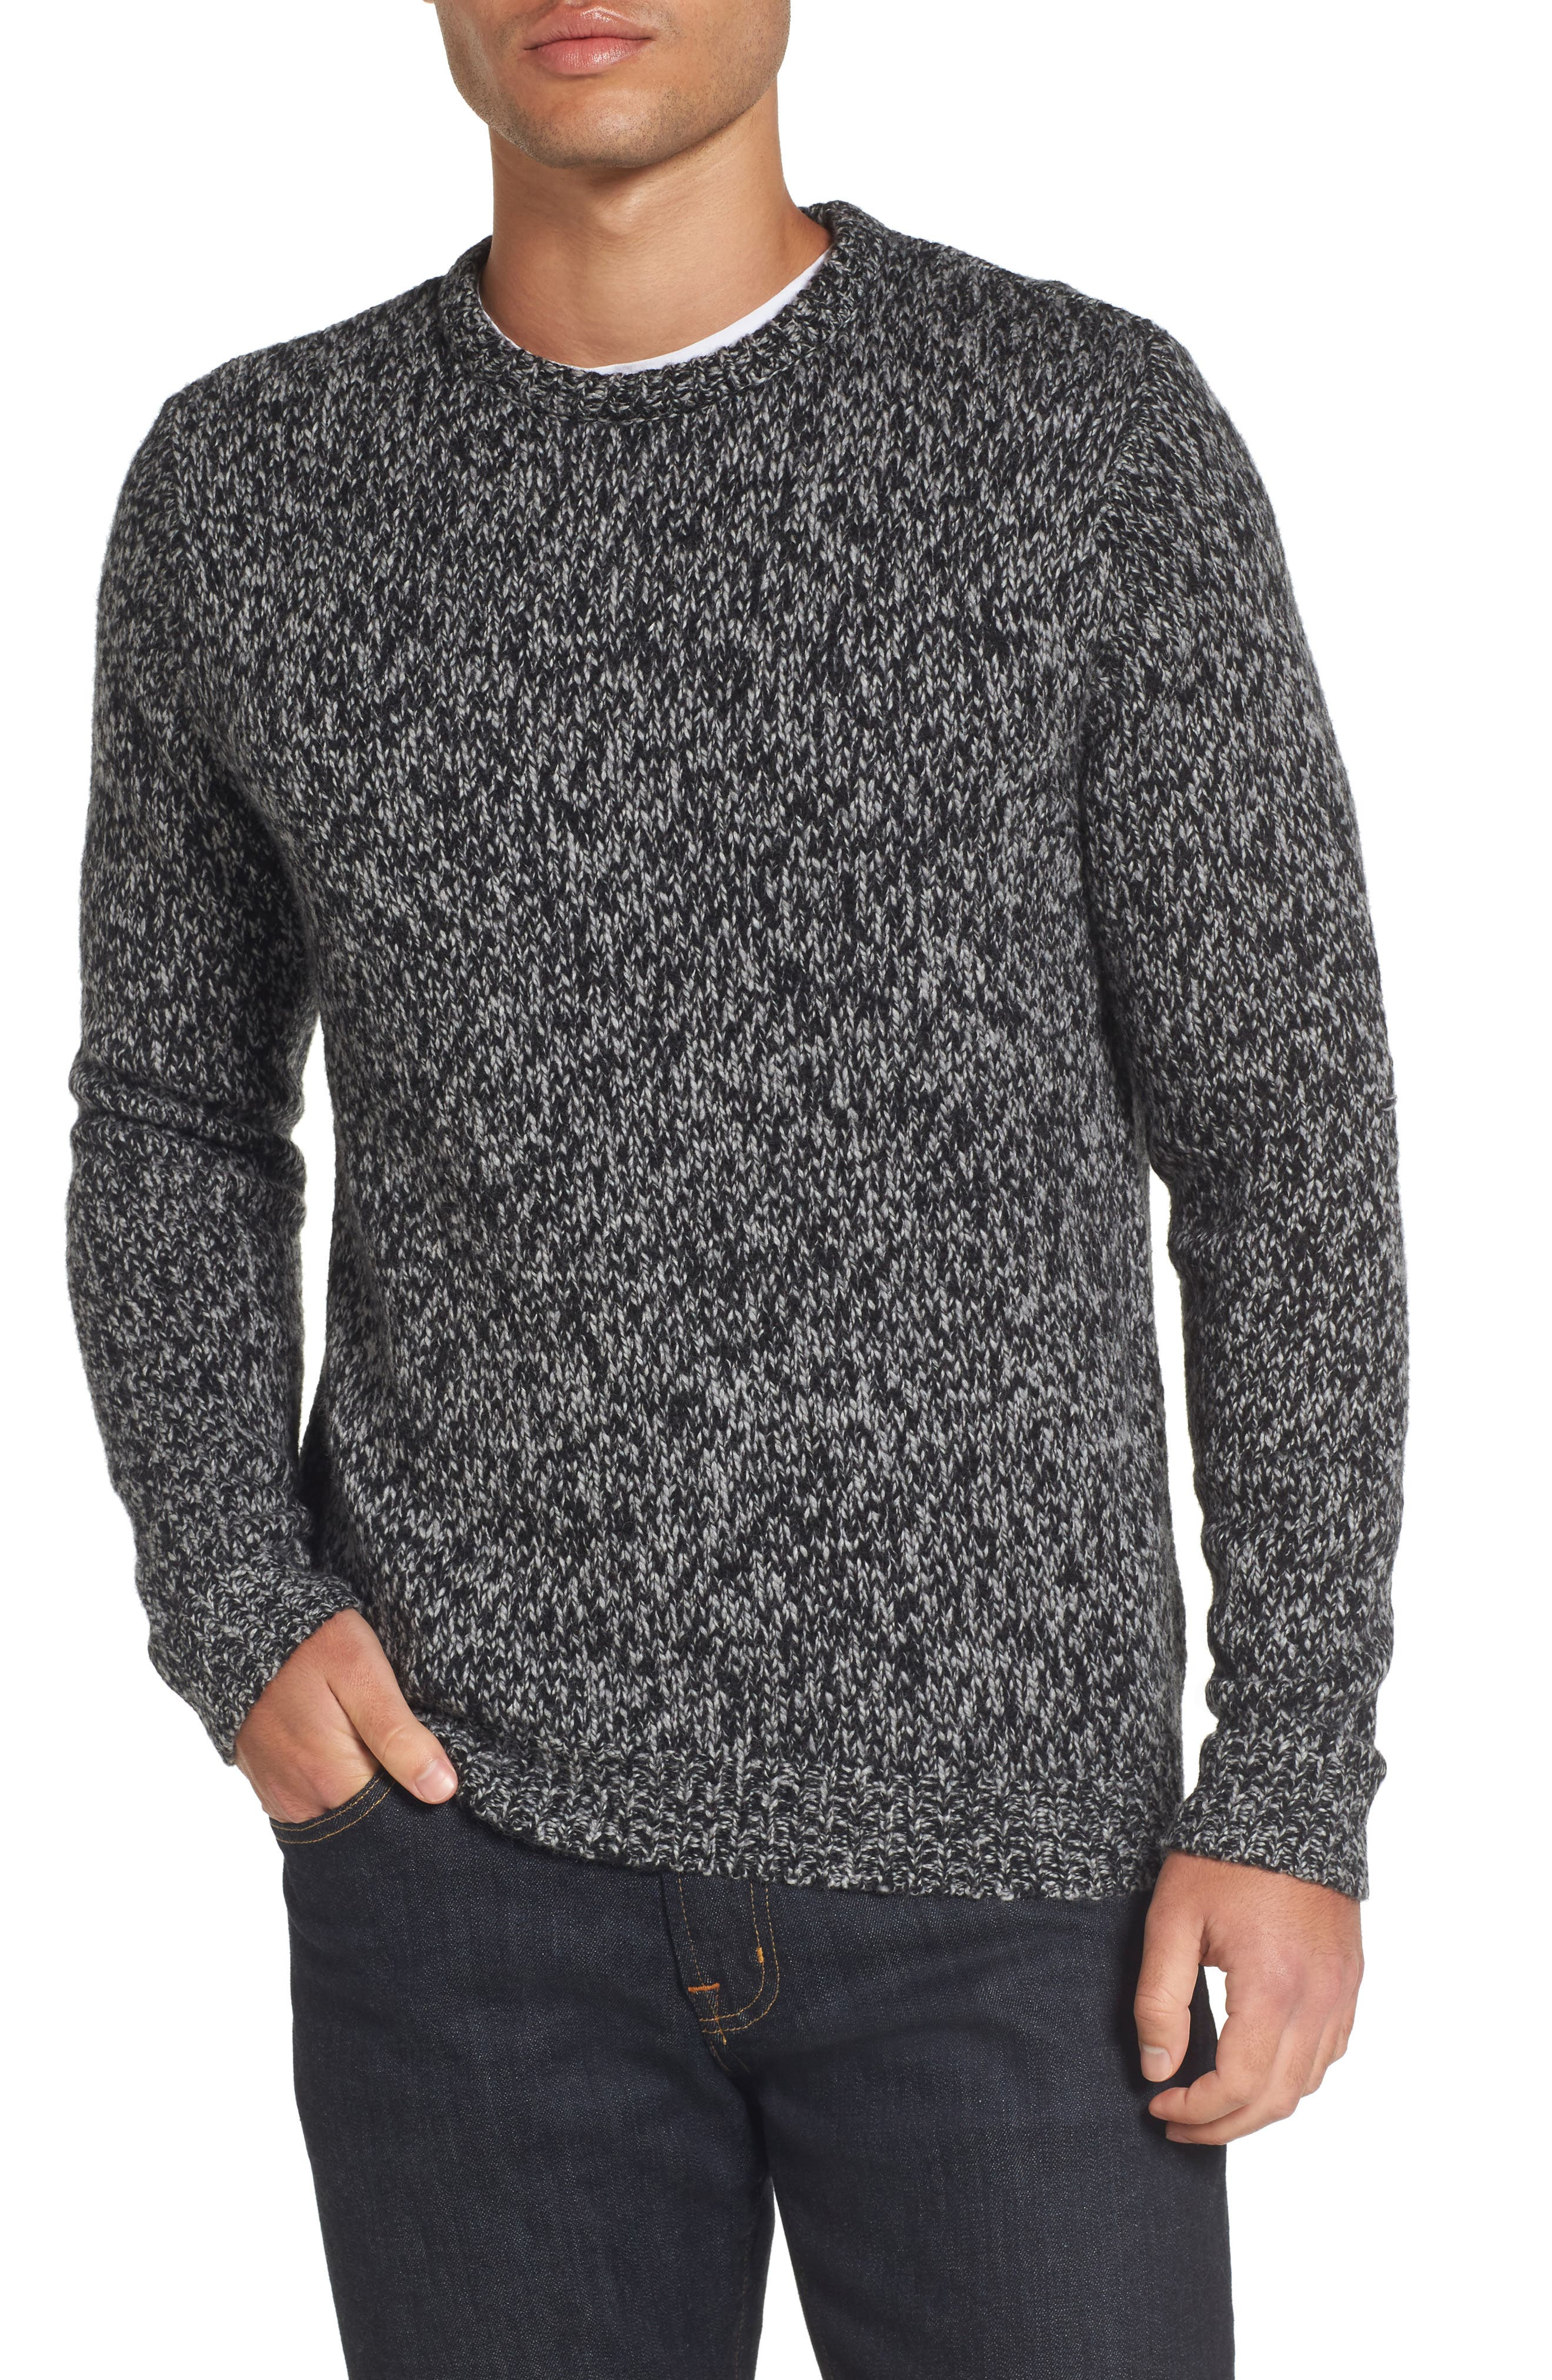 Main Image - Nordstrom Men's Shop Marled Yarn Sweater